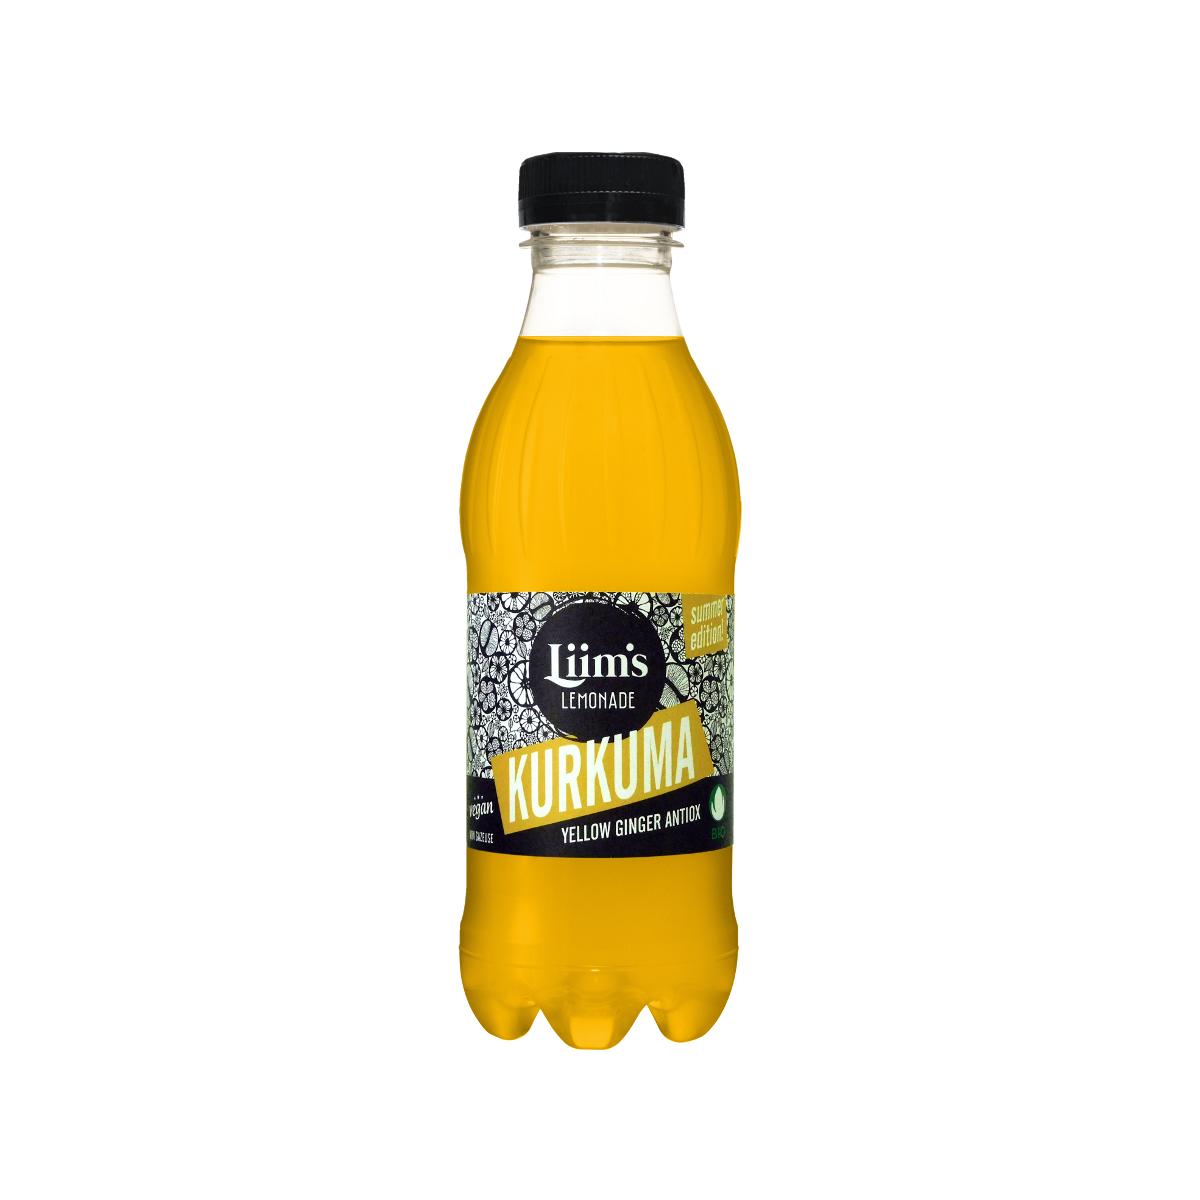 Liim s Kurkuma Antiox Limonade